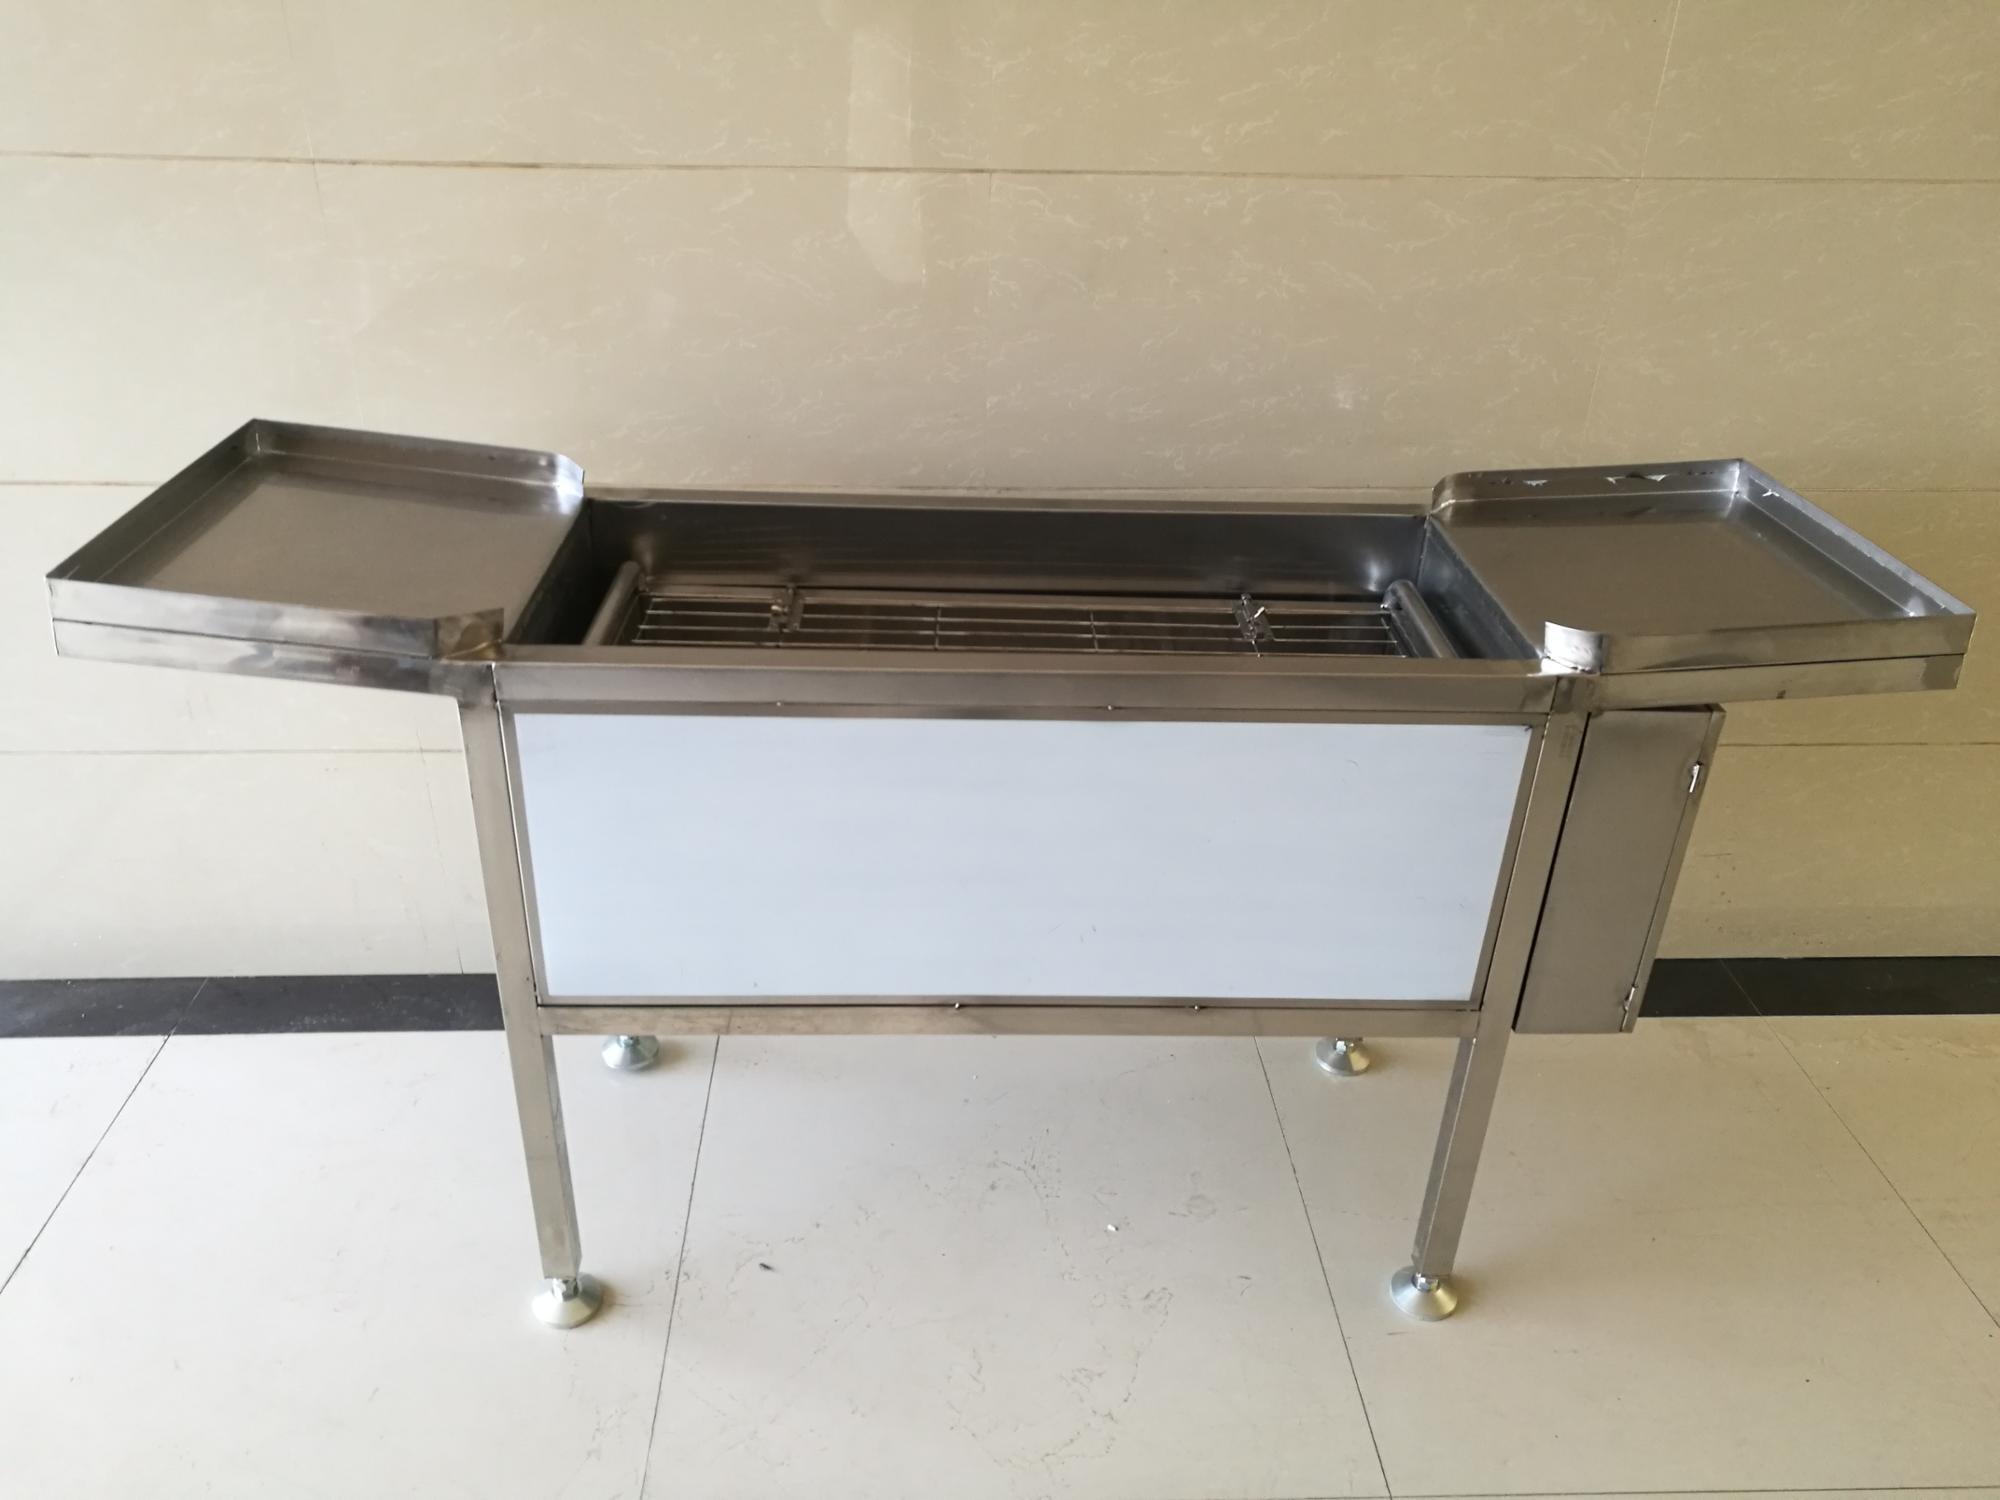 water-bath-tester-machine-for-aerosol-products-1